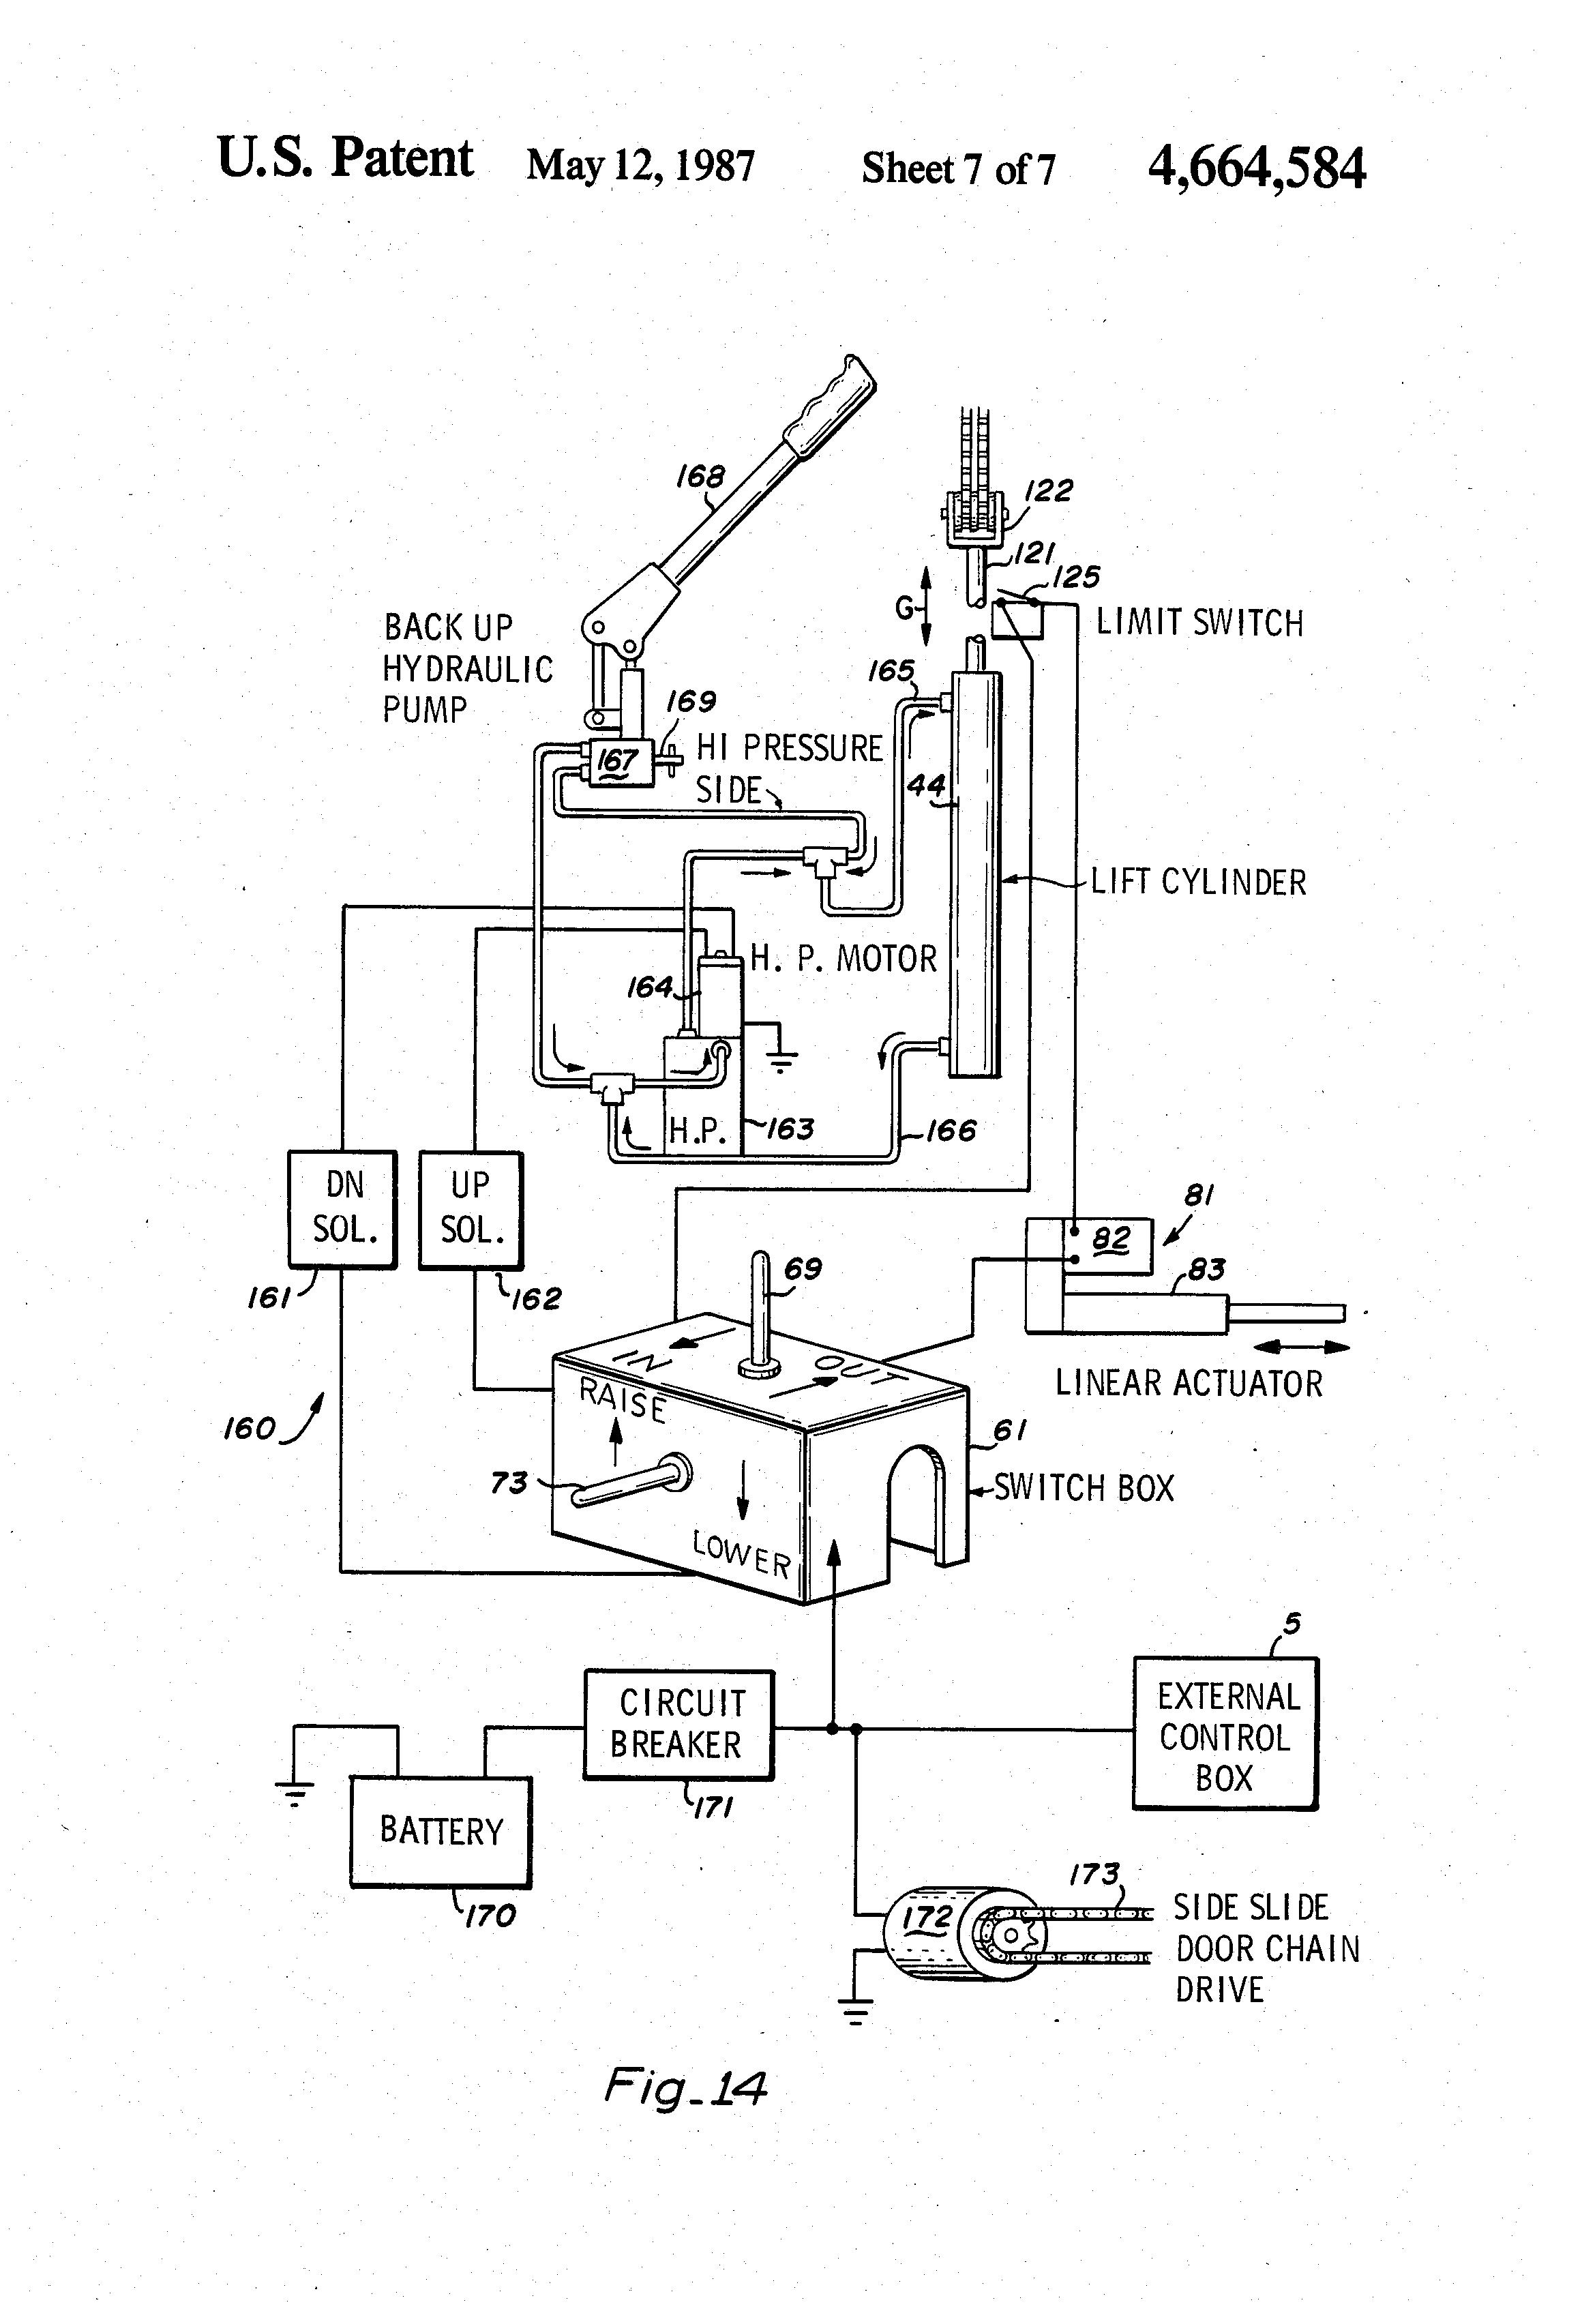 Ricon Wheelchair Lift Wiring Diagram - Ricon Wheelchair Lift Wiring Diagram Braun Lift Parts Diagram Elegant Automotive Lift Wiring Diagram 8s